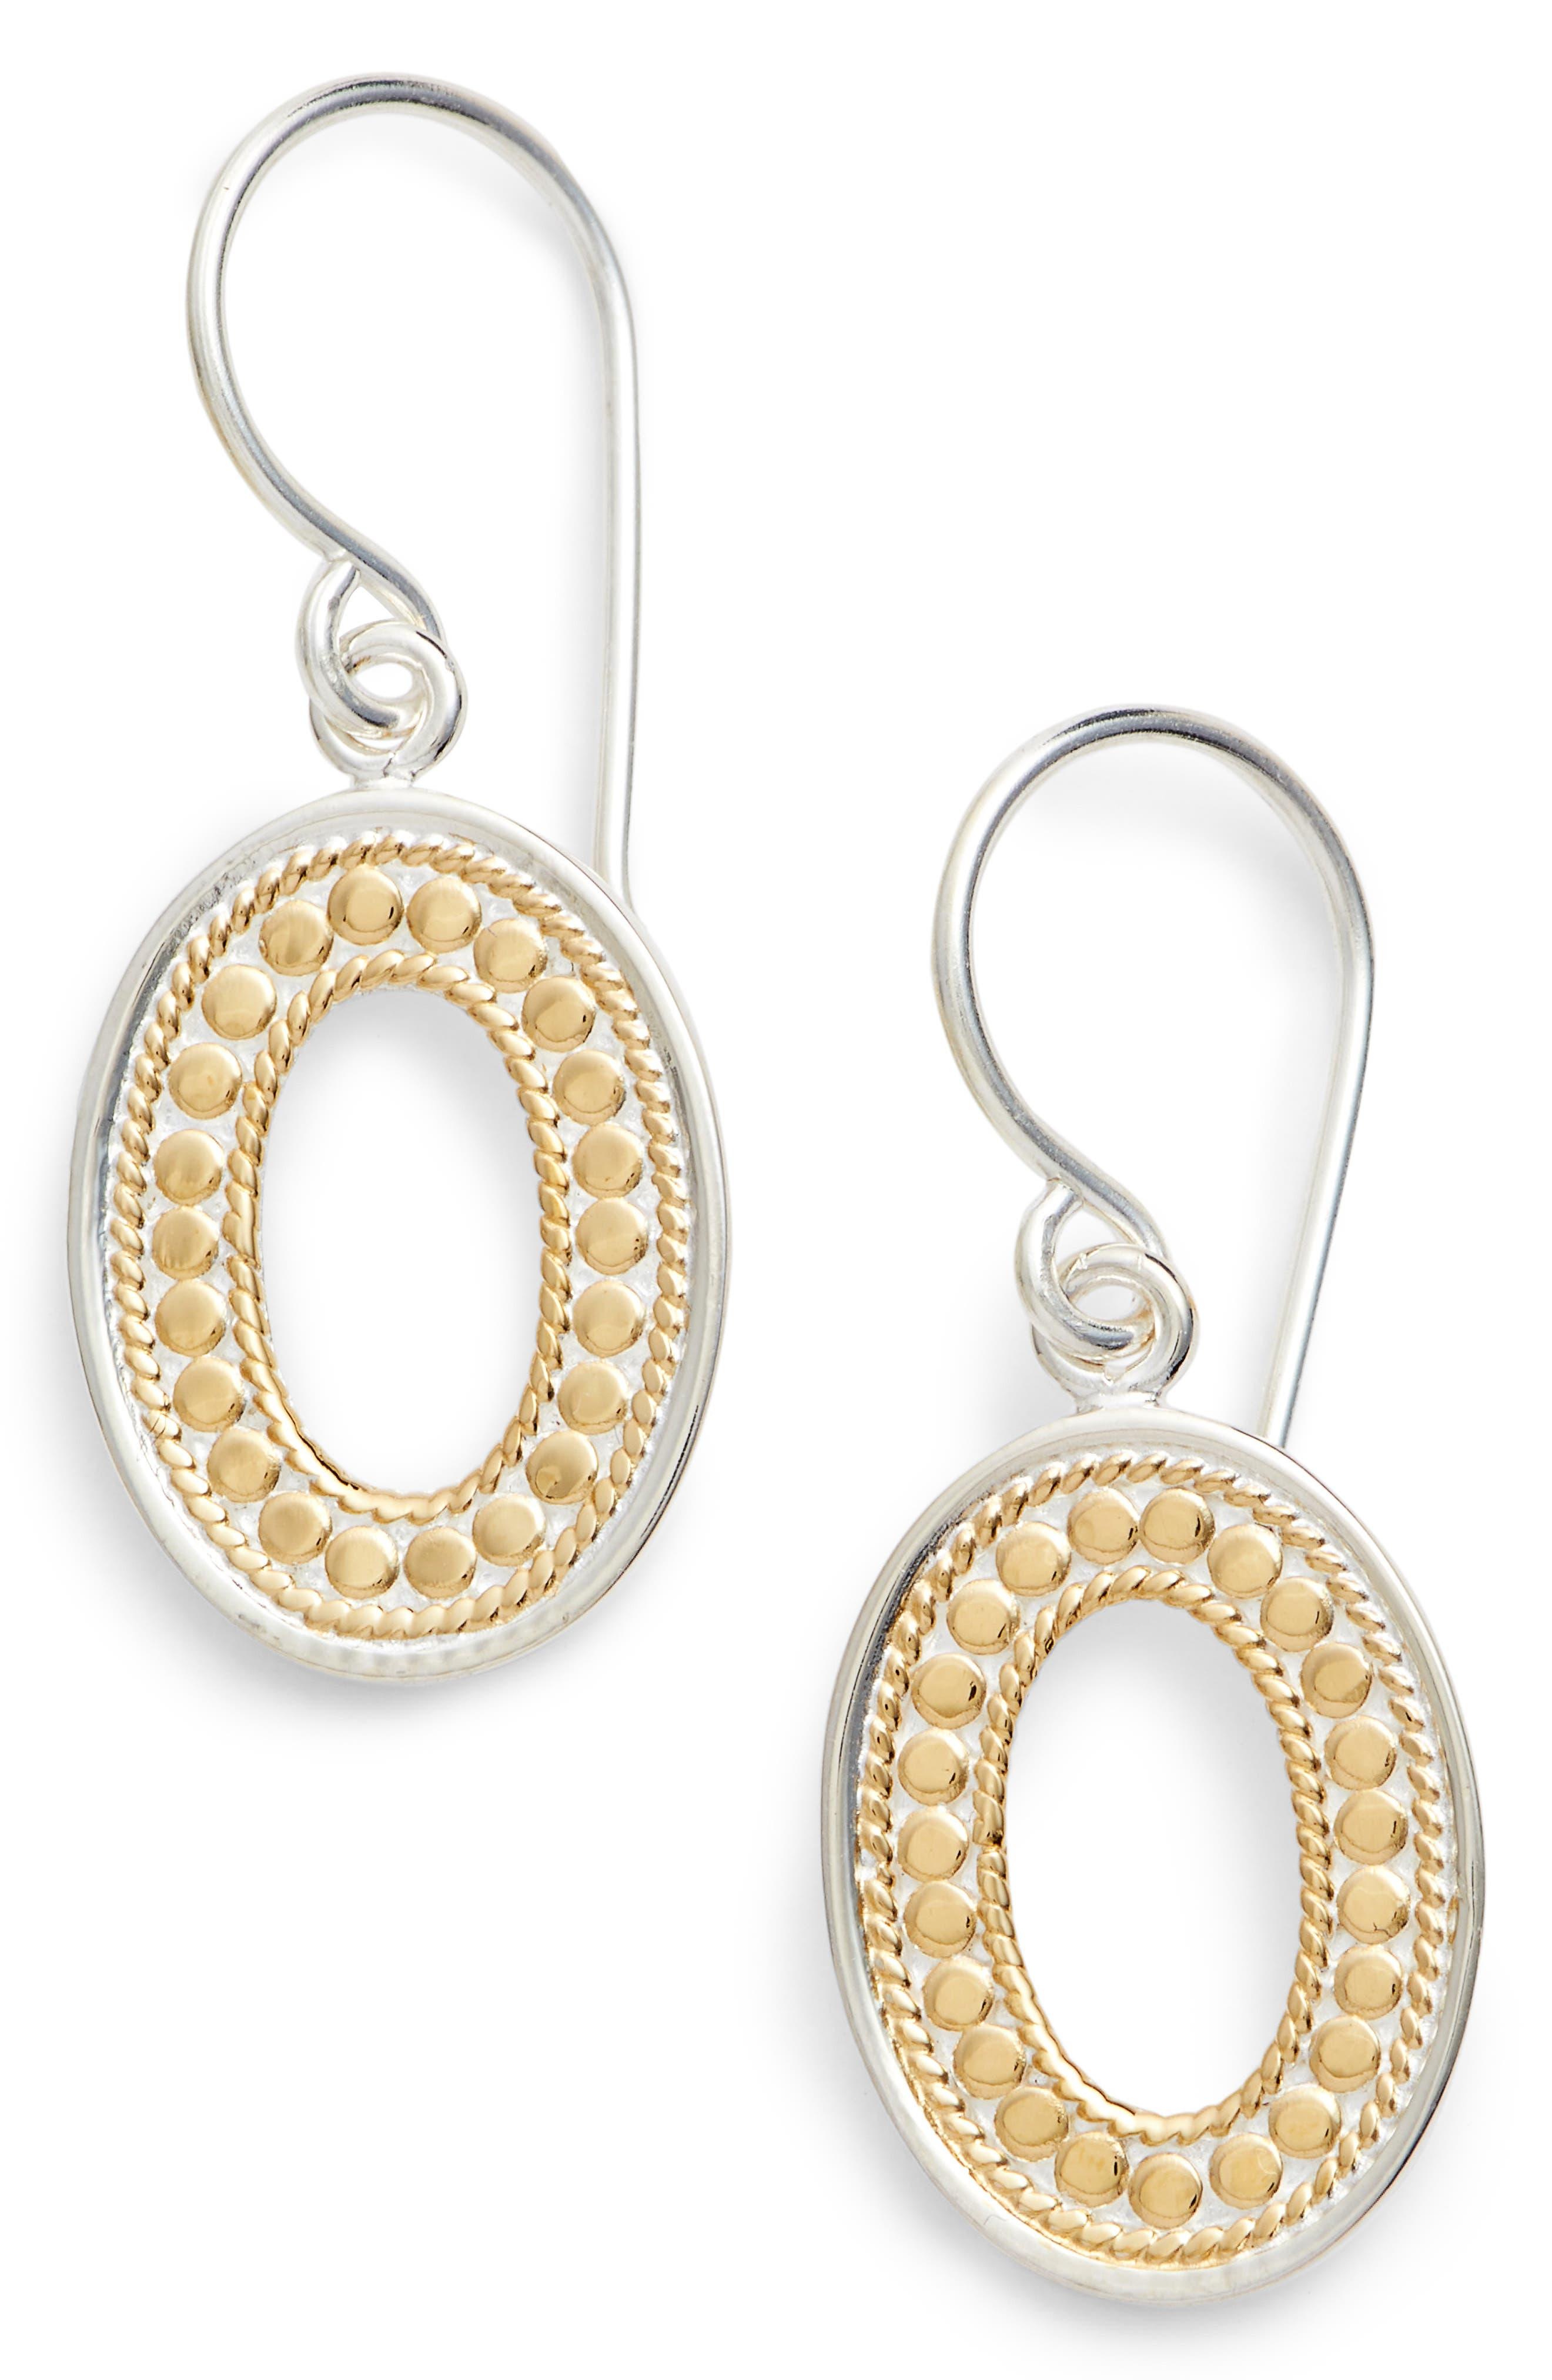 Open Oval Drop Earrings,                             Main thumbnail 1, color,                             GOLD